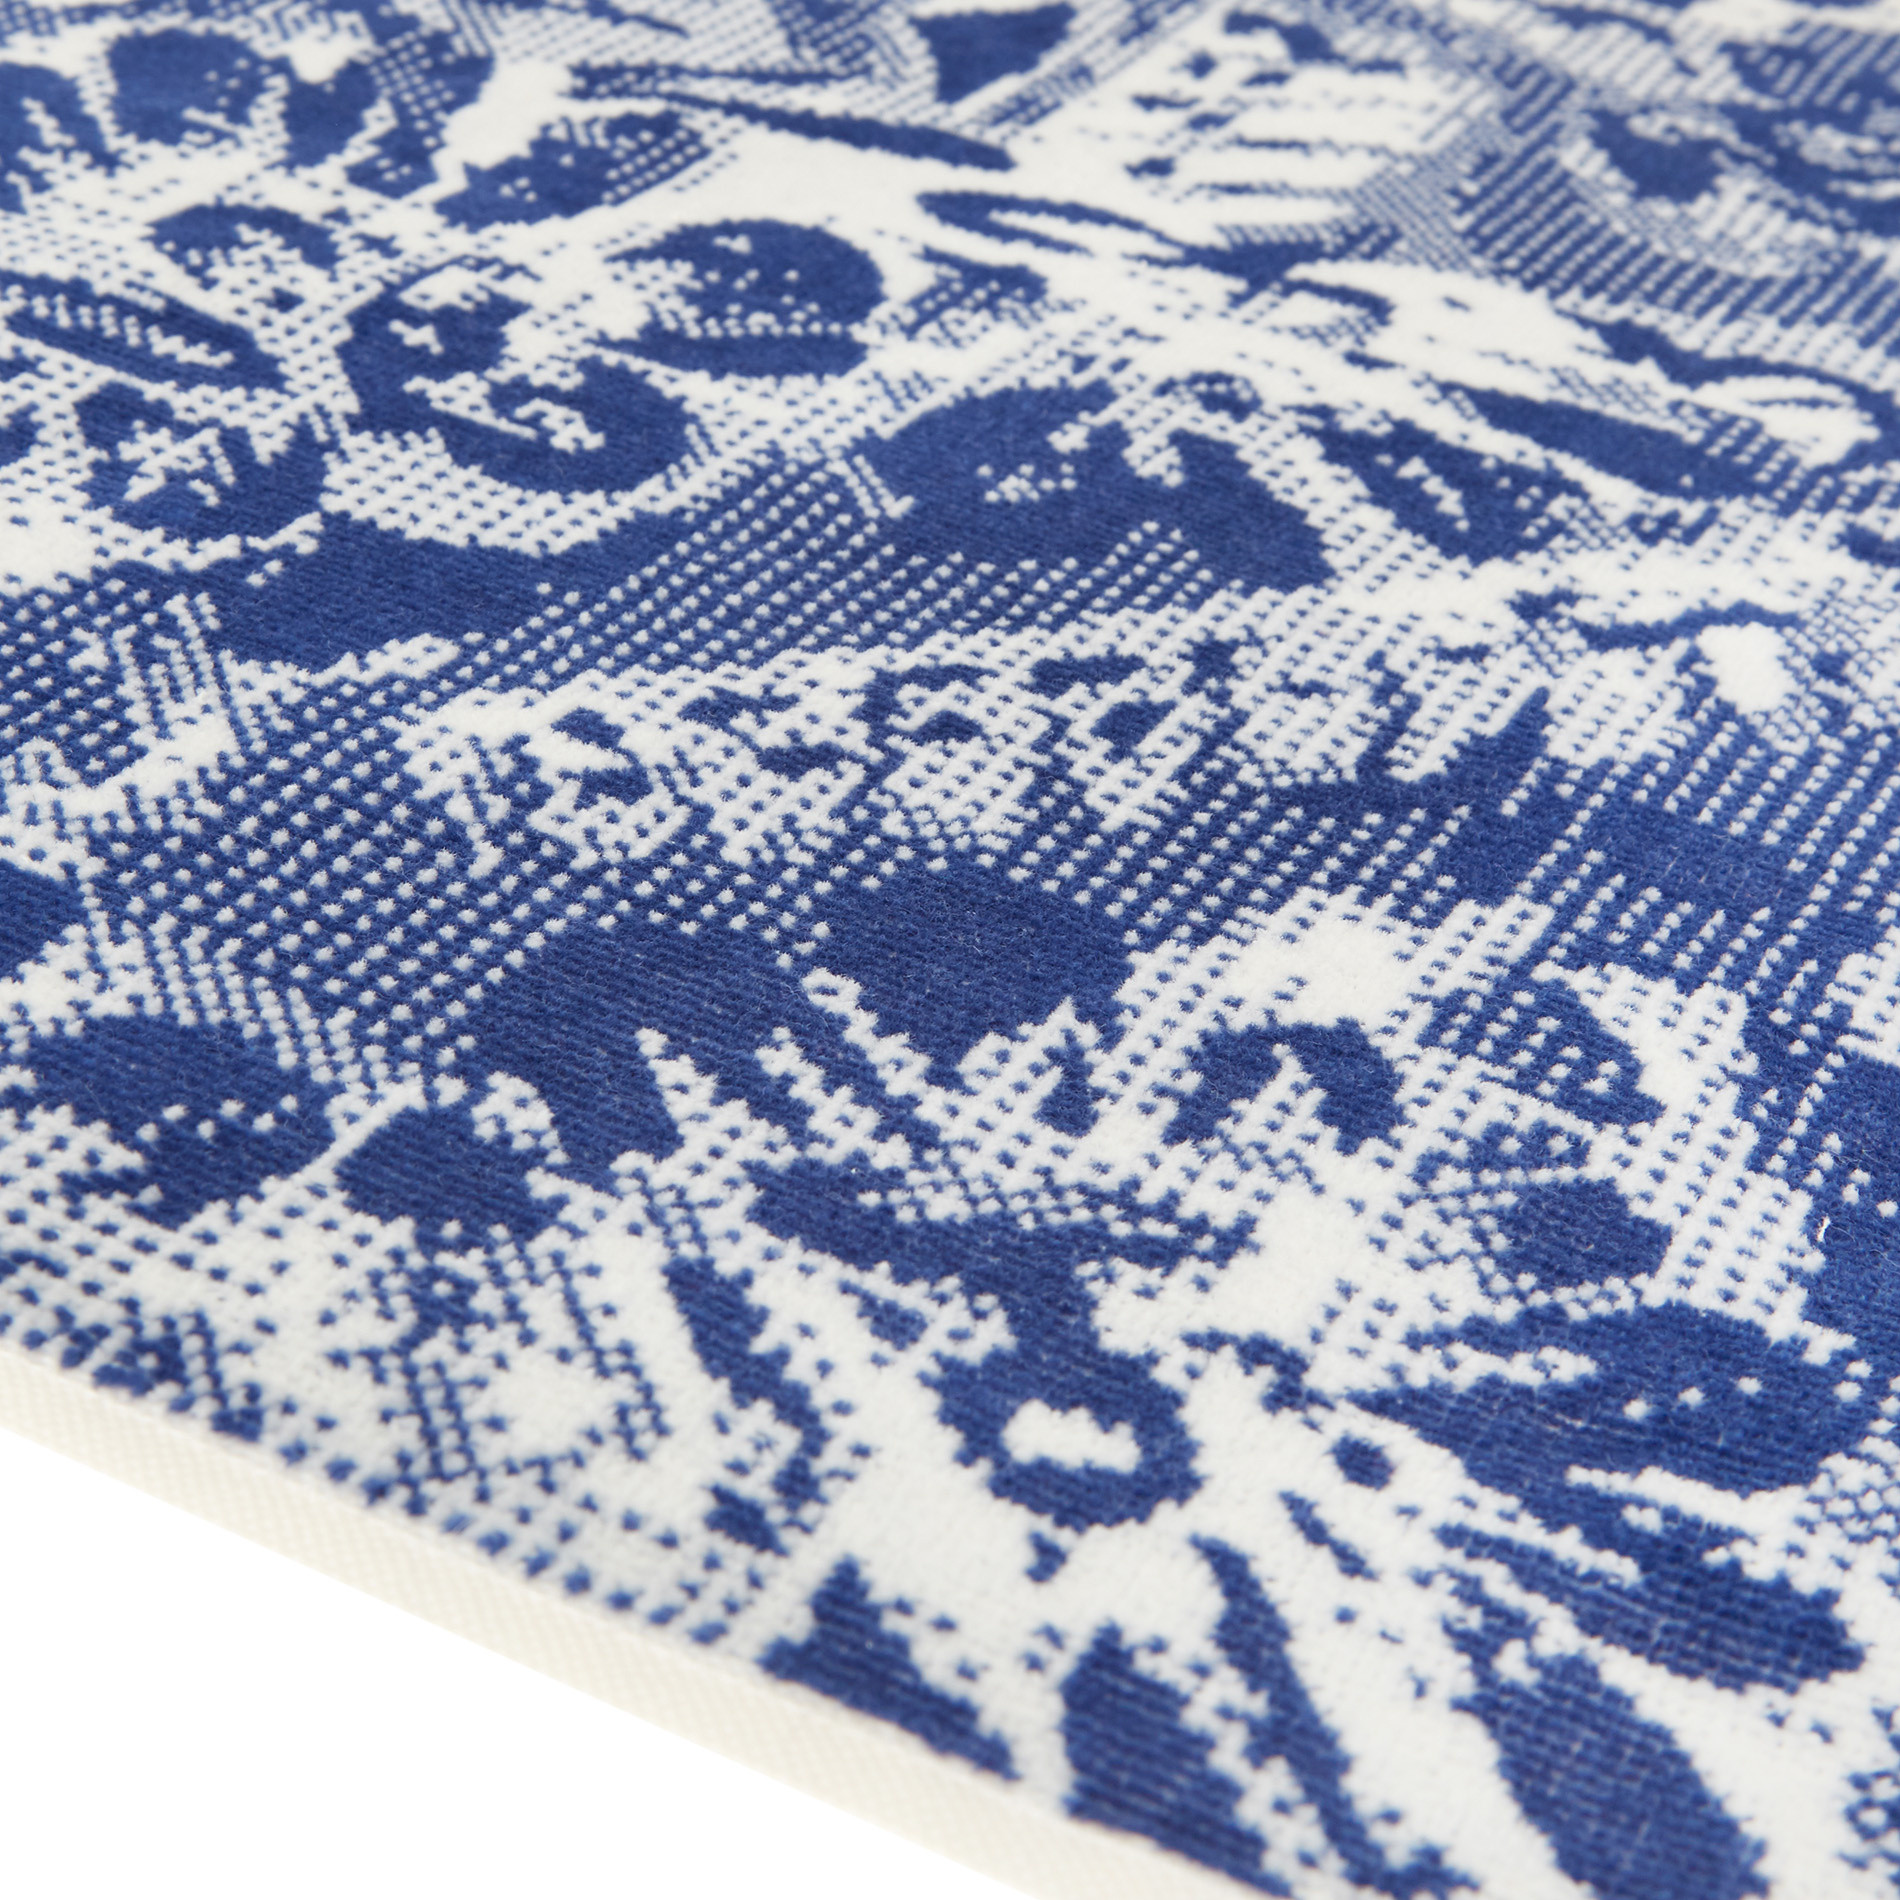 Asciugamano cotone velour motivo floreale, Blu, large image number 2